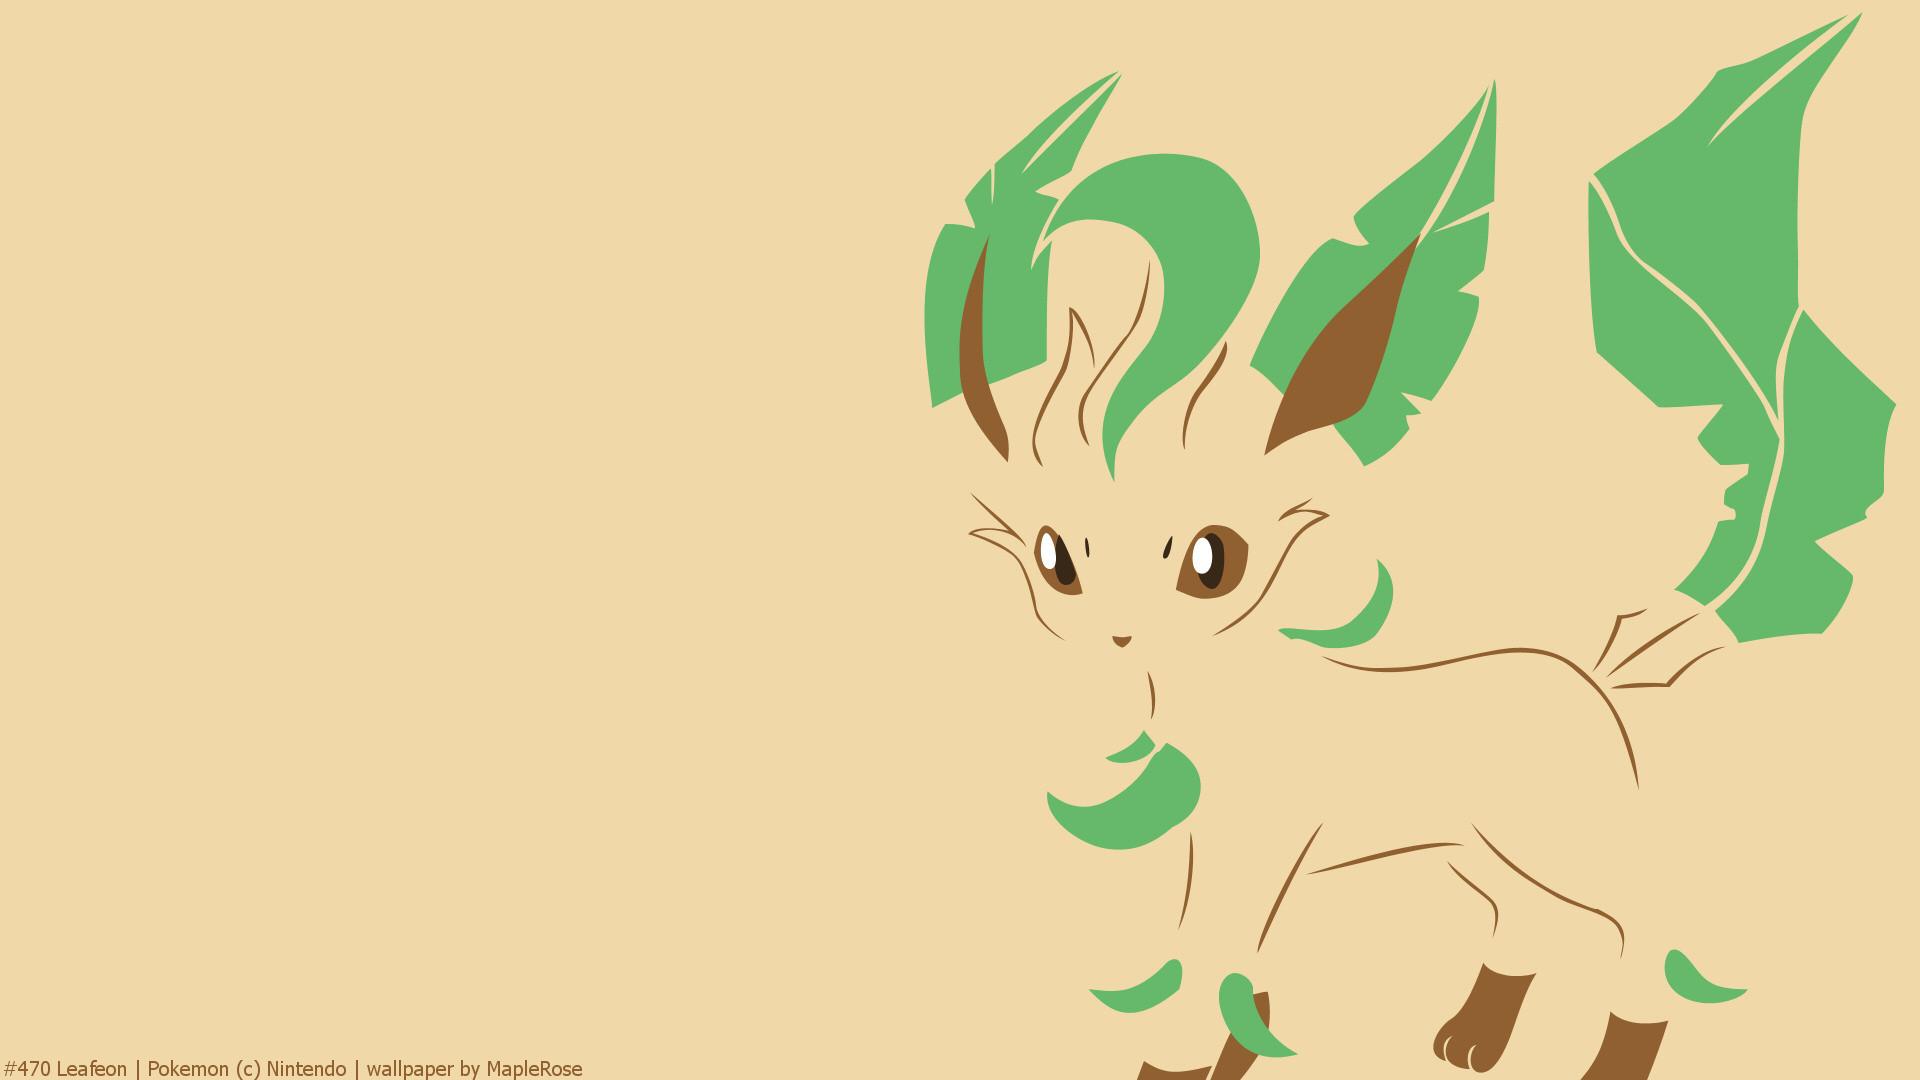 Anime РPok̩mon Leafeon (Pok̩mon) Eeveelutions Wallpaper